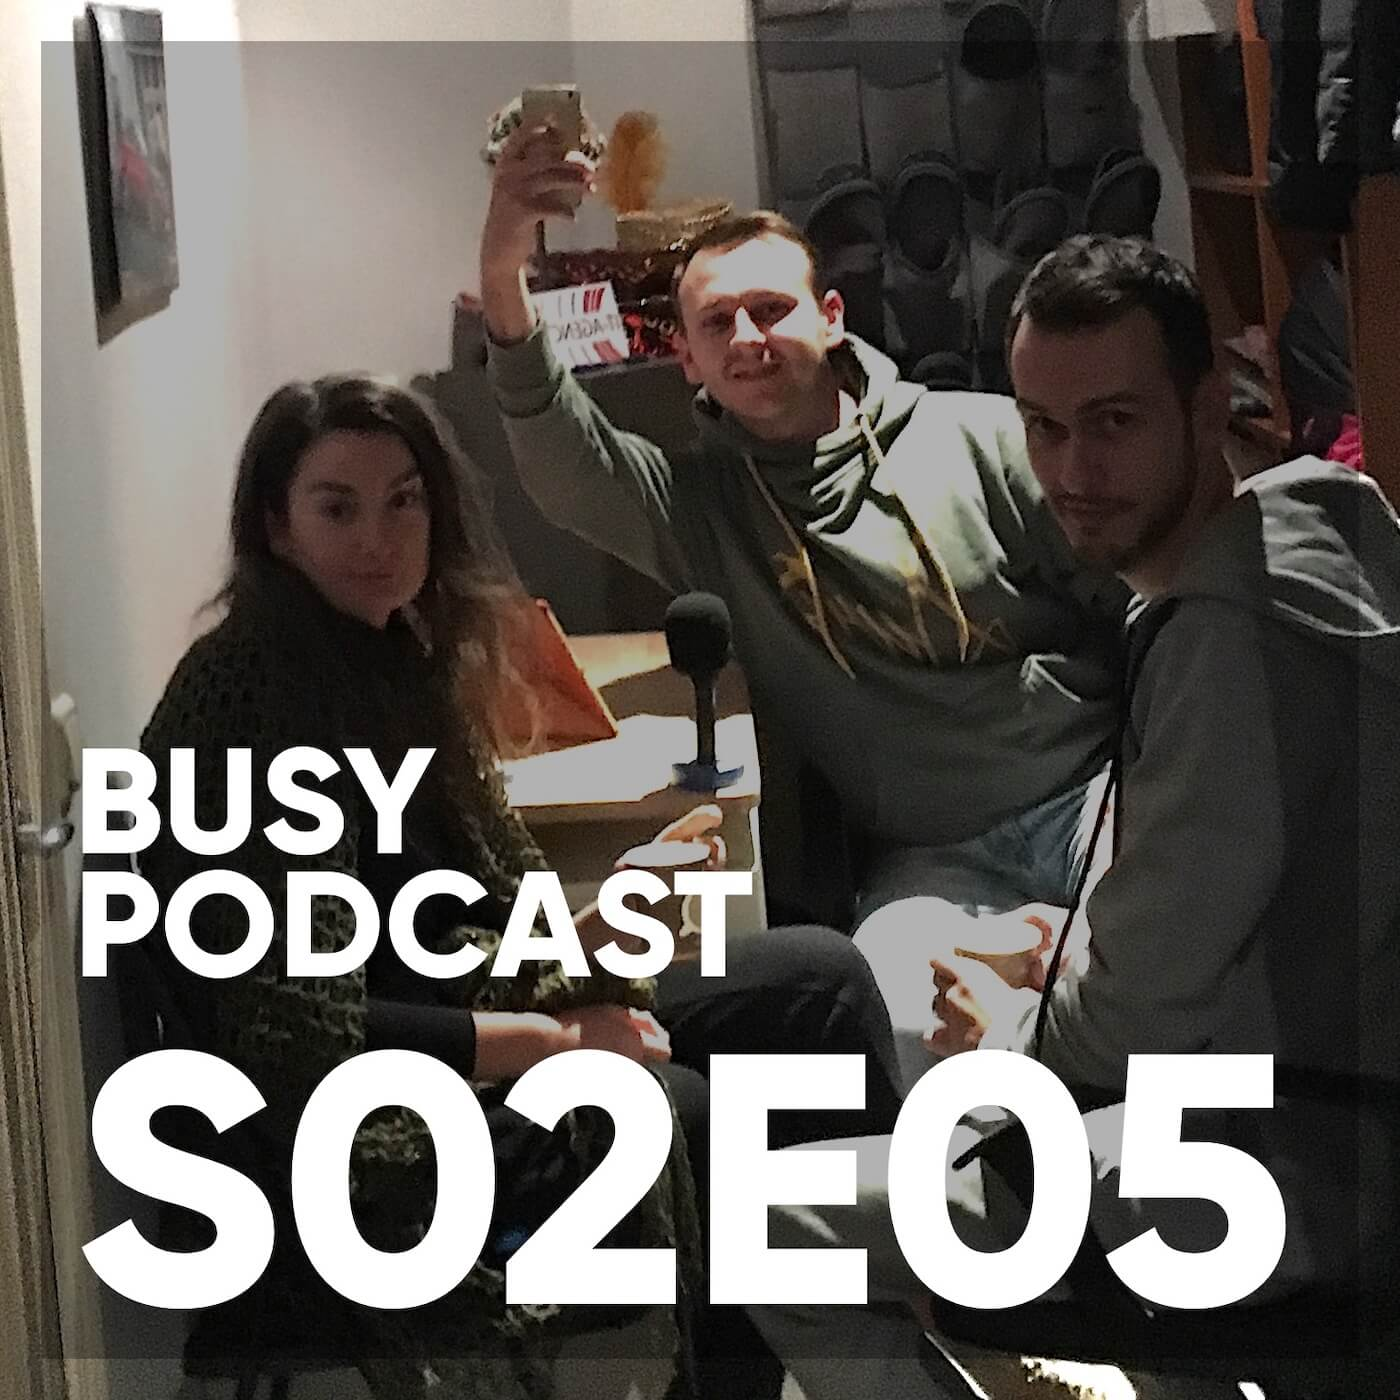 Busy Podcast S02E05: развитие дизайнера в команде на примере IT-Agency